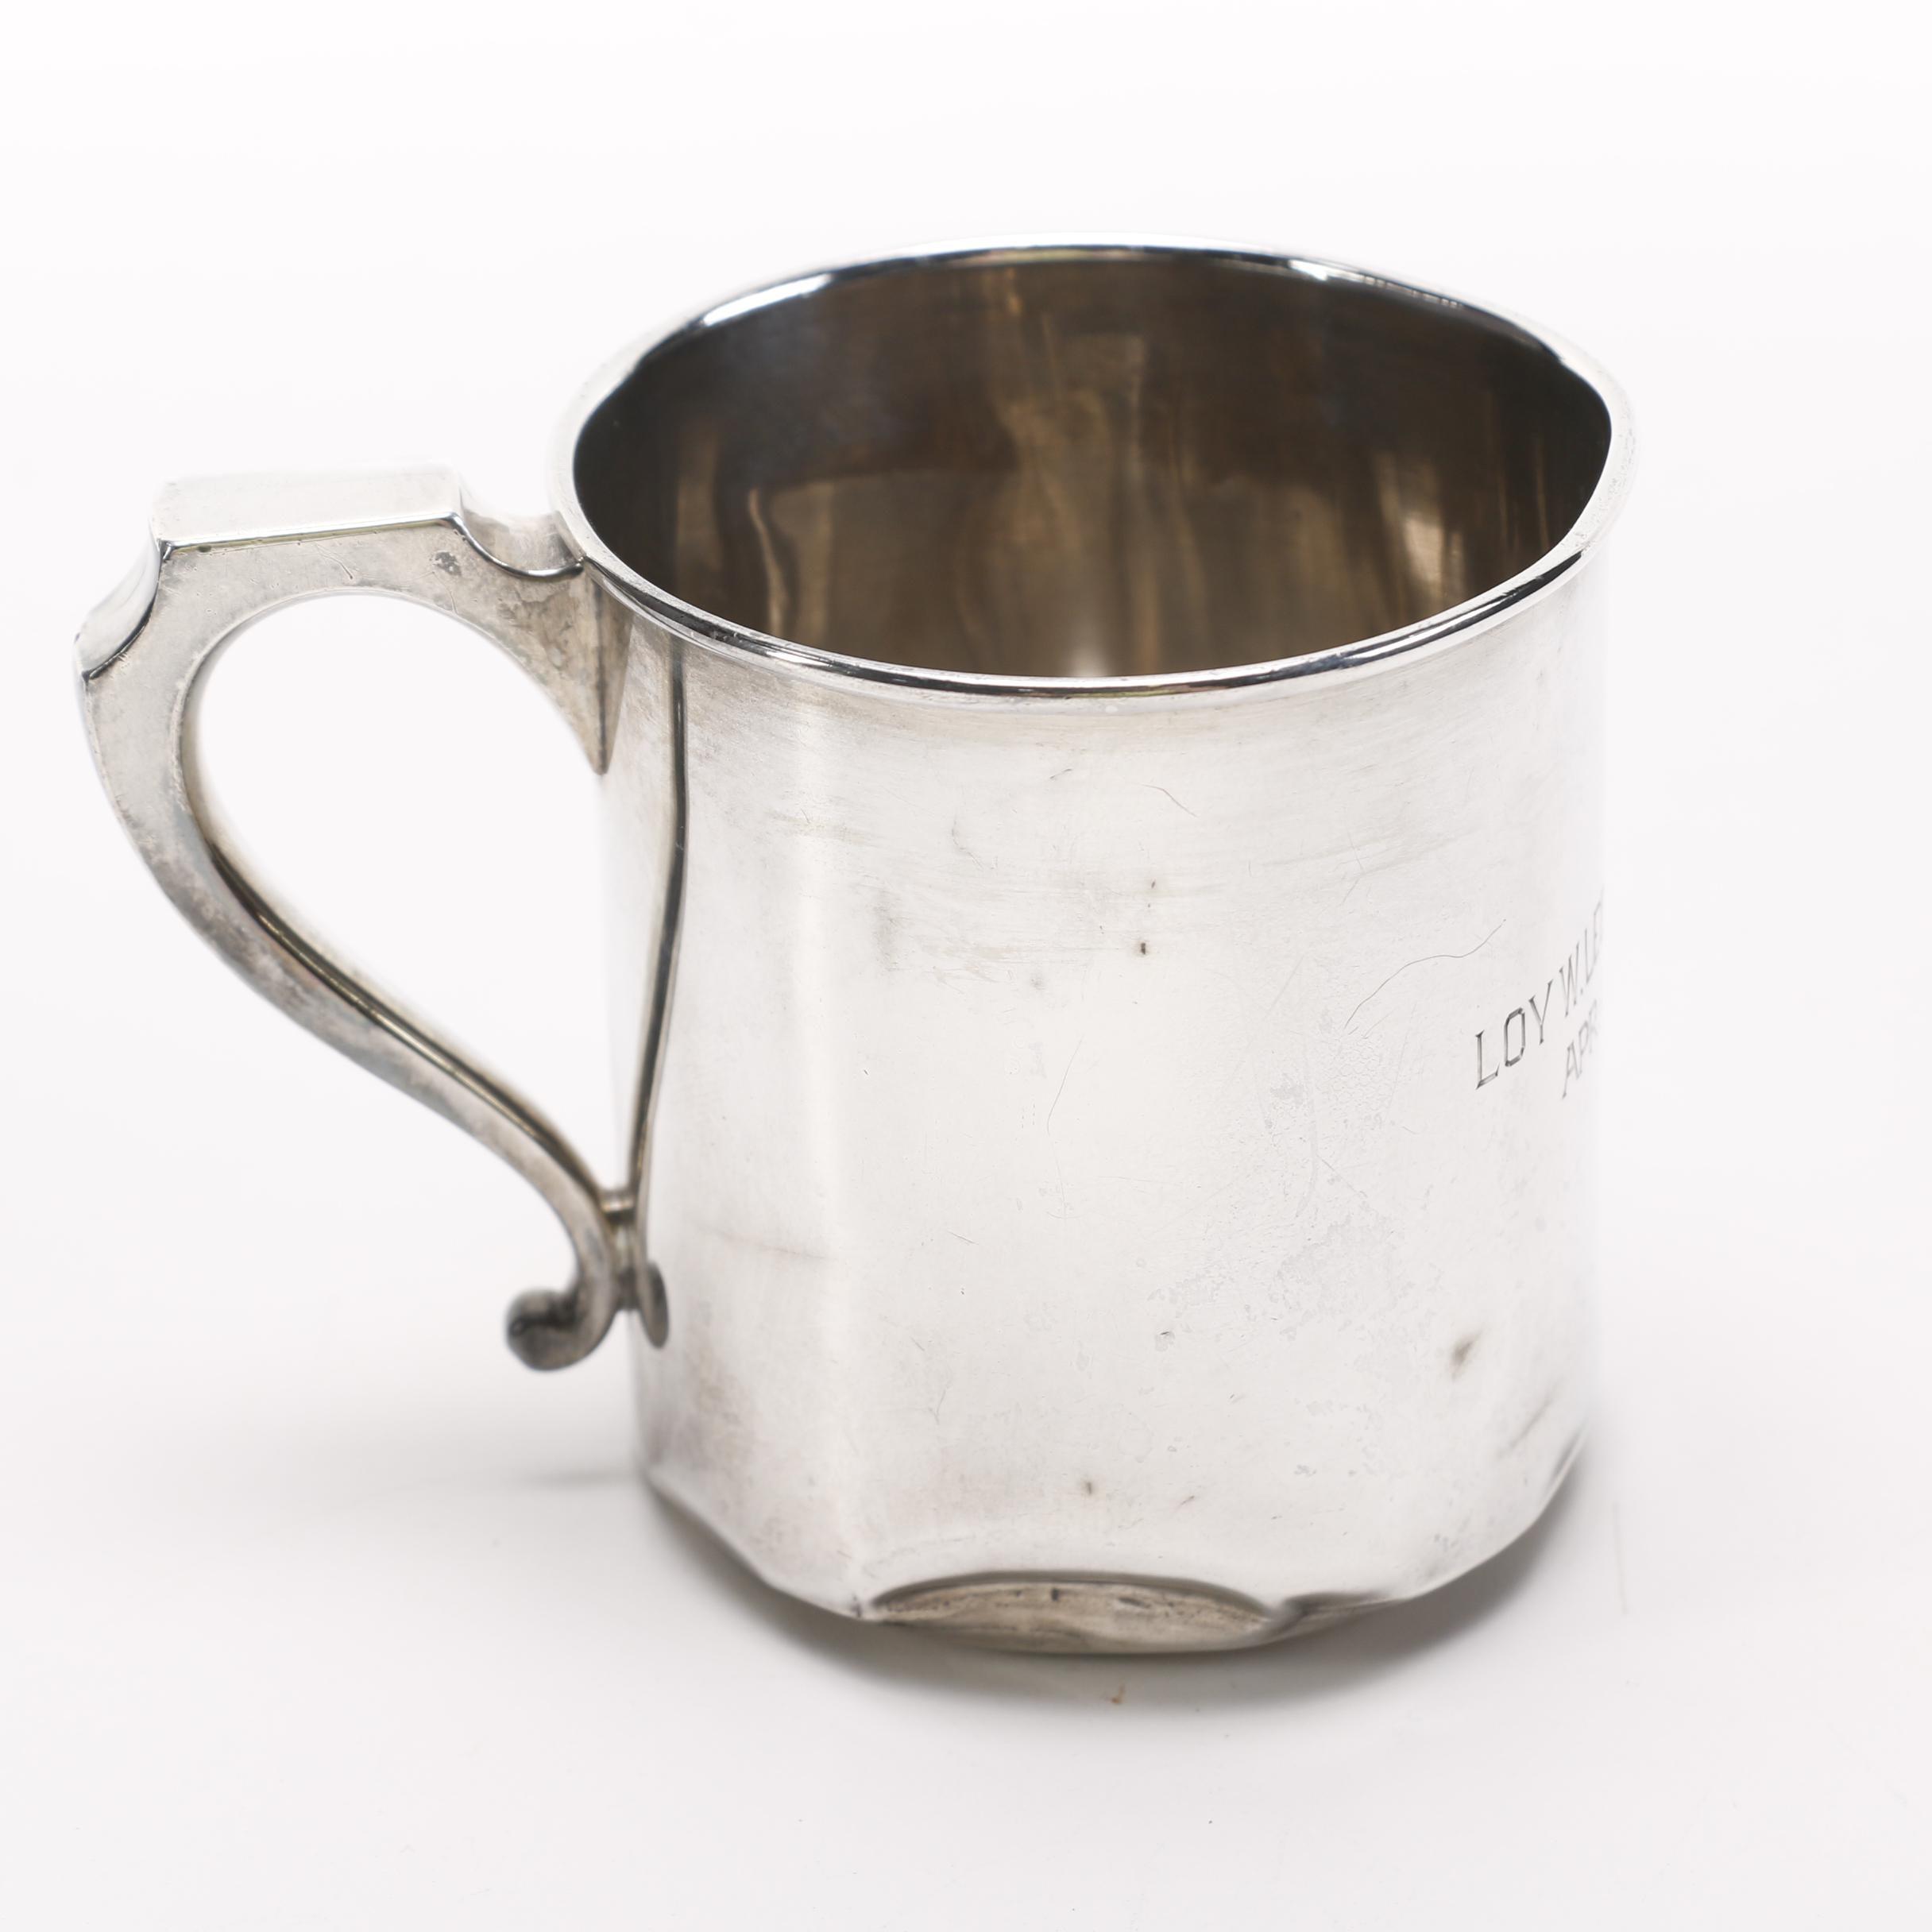 La Pierre Mfg. Co. Sterling Baby Cup